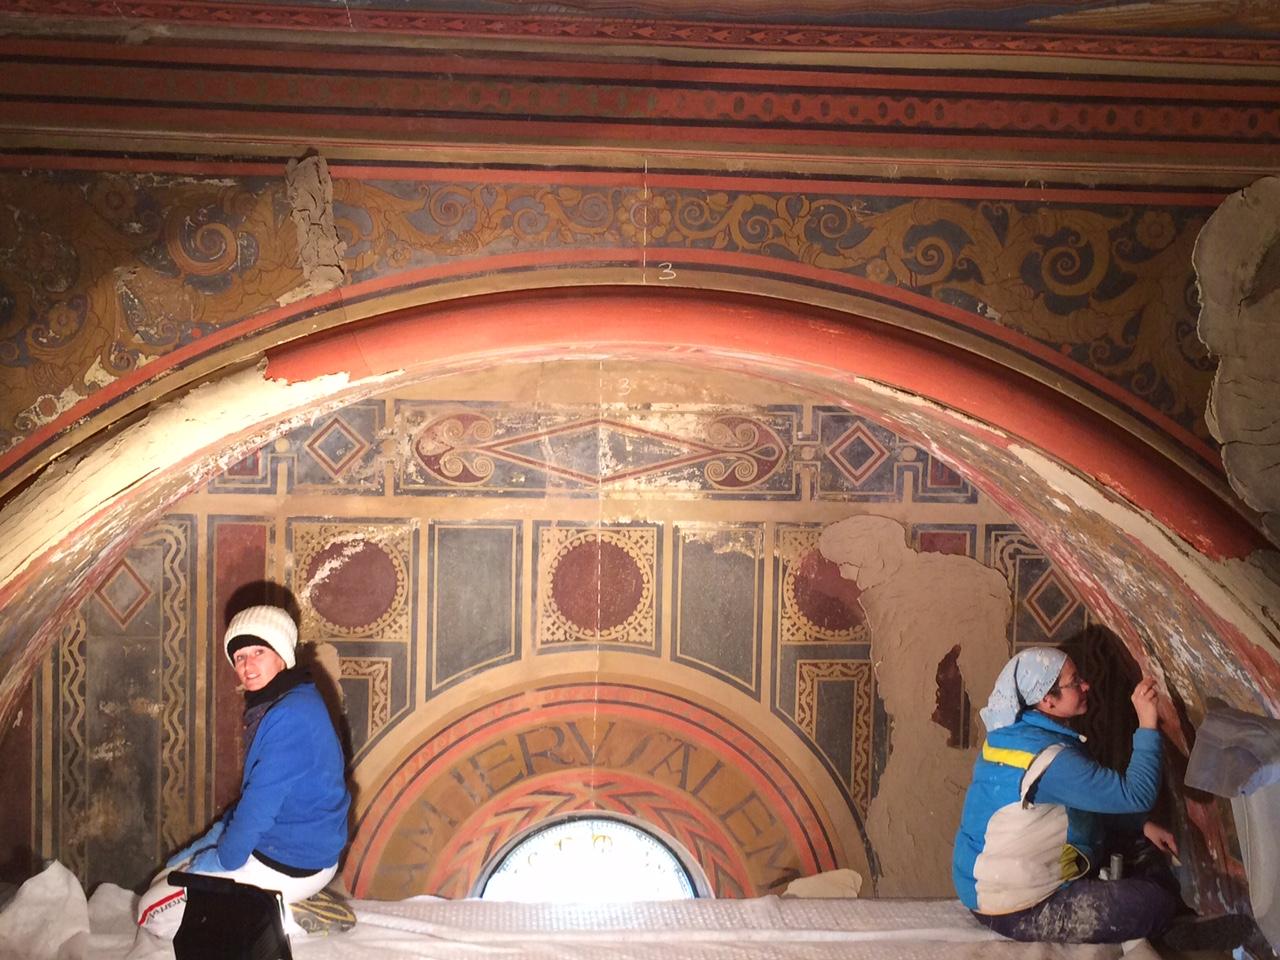 Recupero affreschi della volta